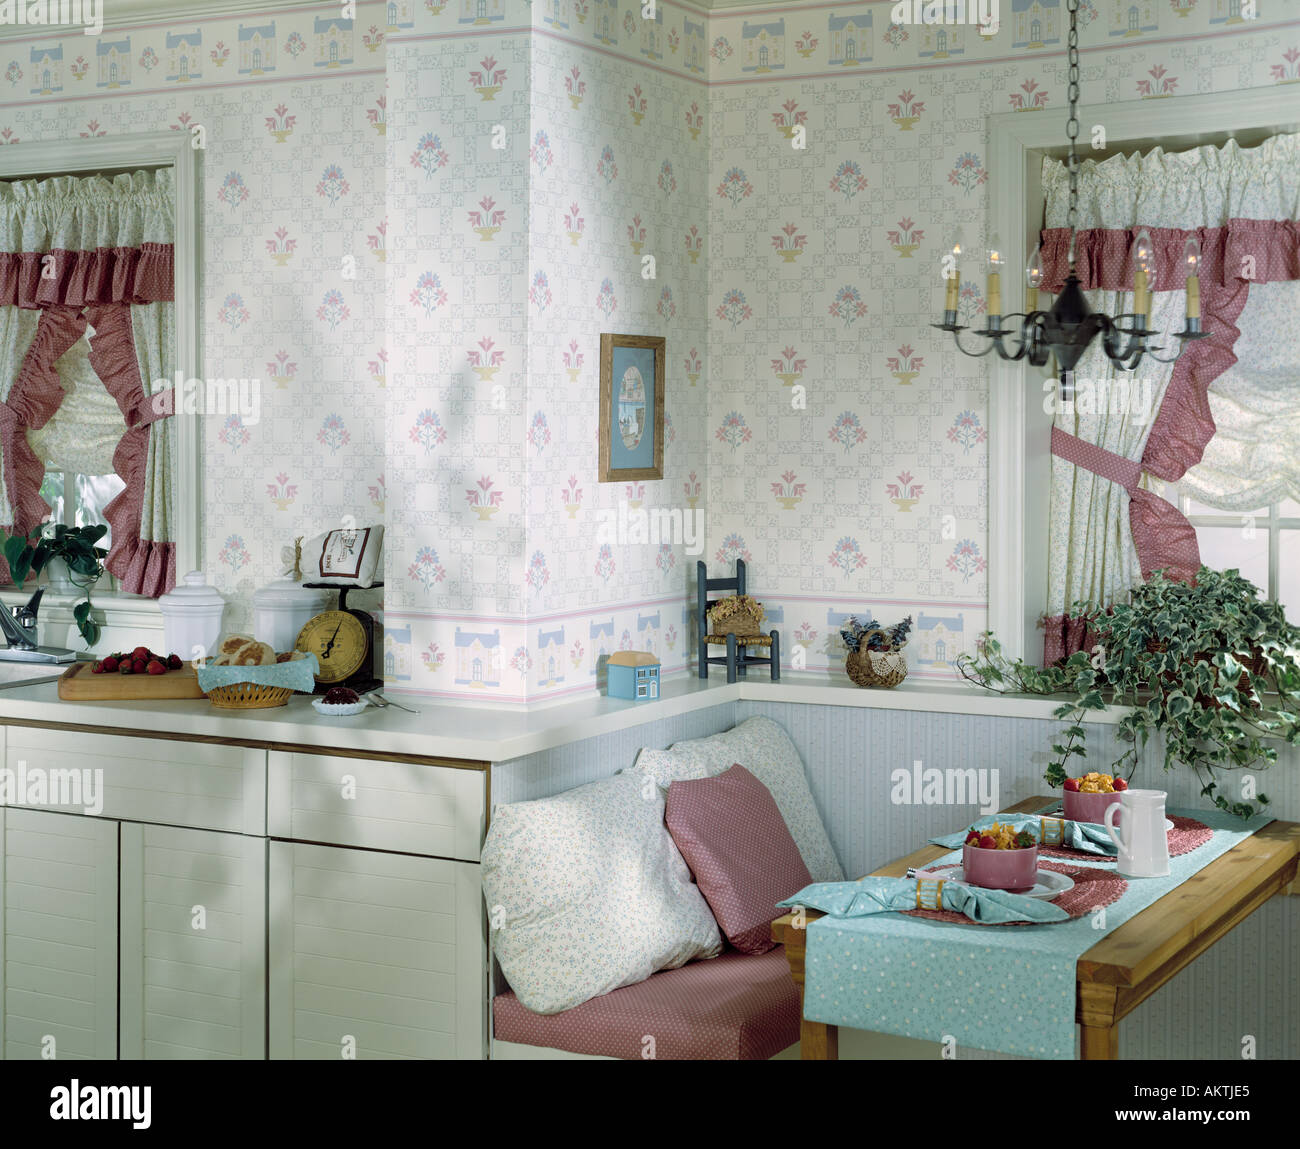 Kitchen Nook Curtains: Kitchen Alcove Breakfast Nook Dining Area Curtain Windows